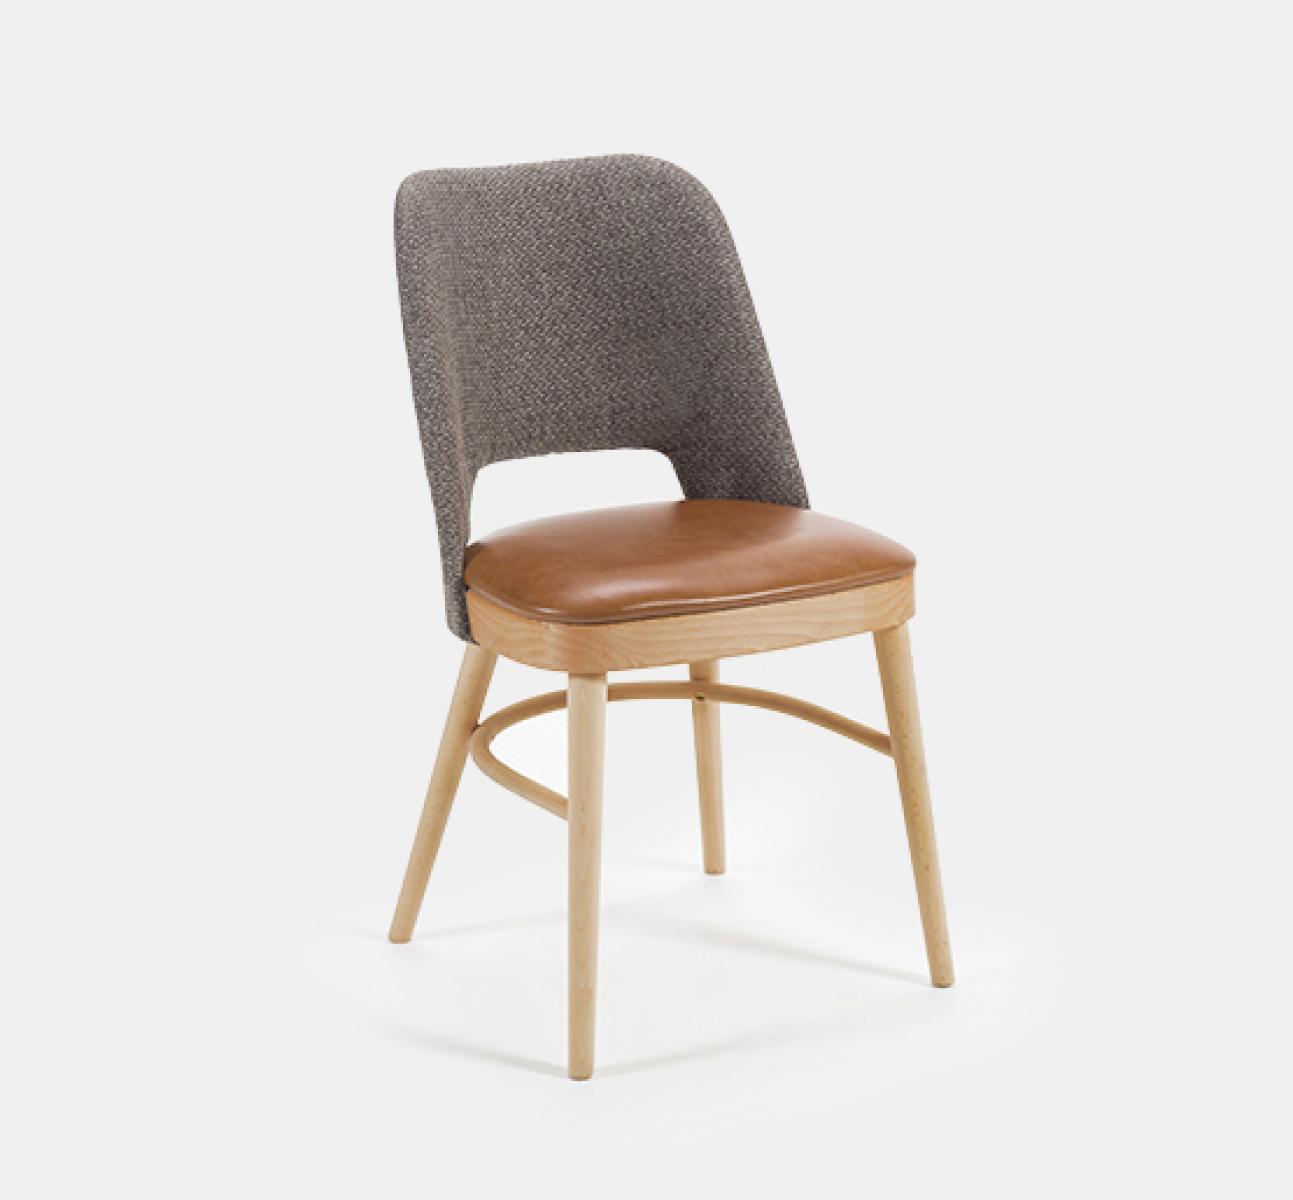 stool chair dubai bedroom lounge side uhs